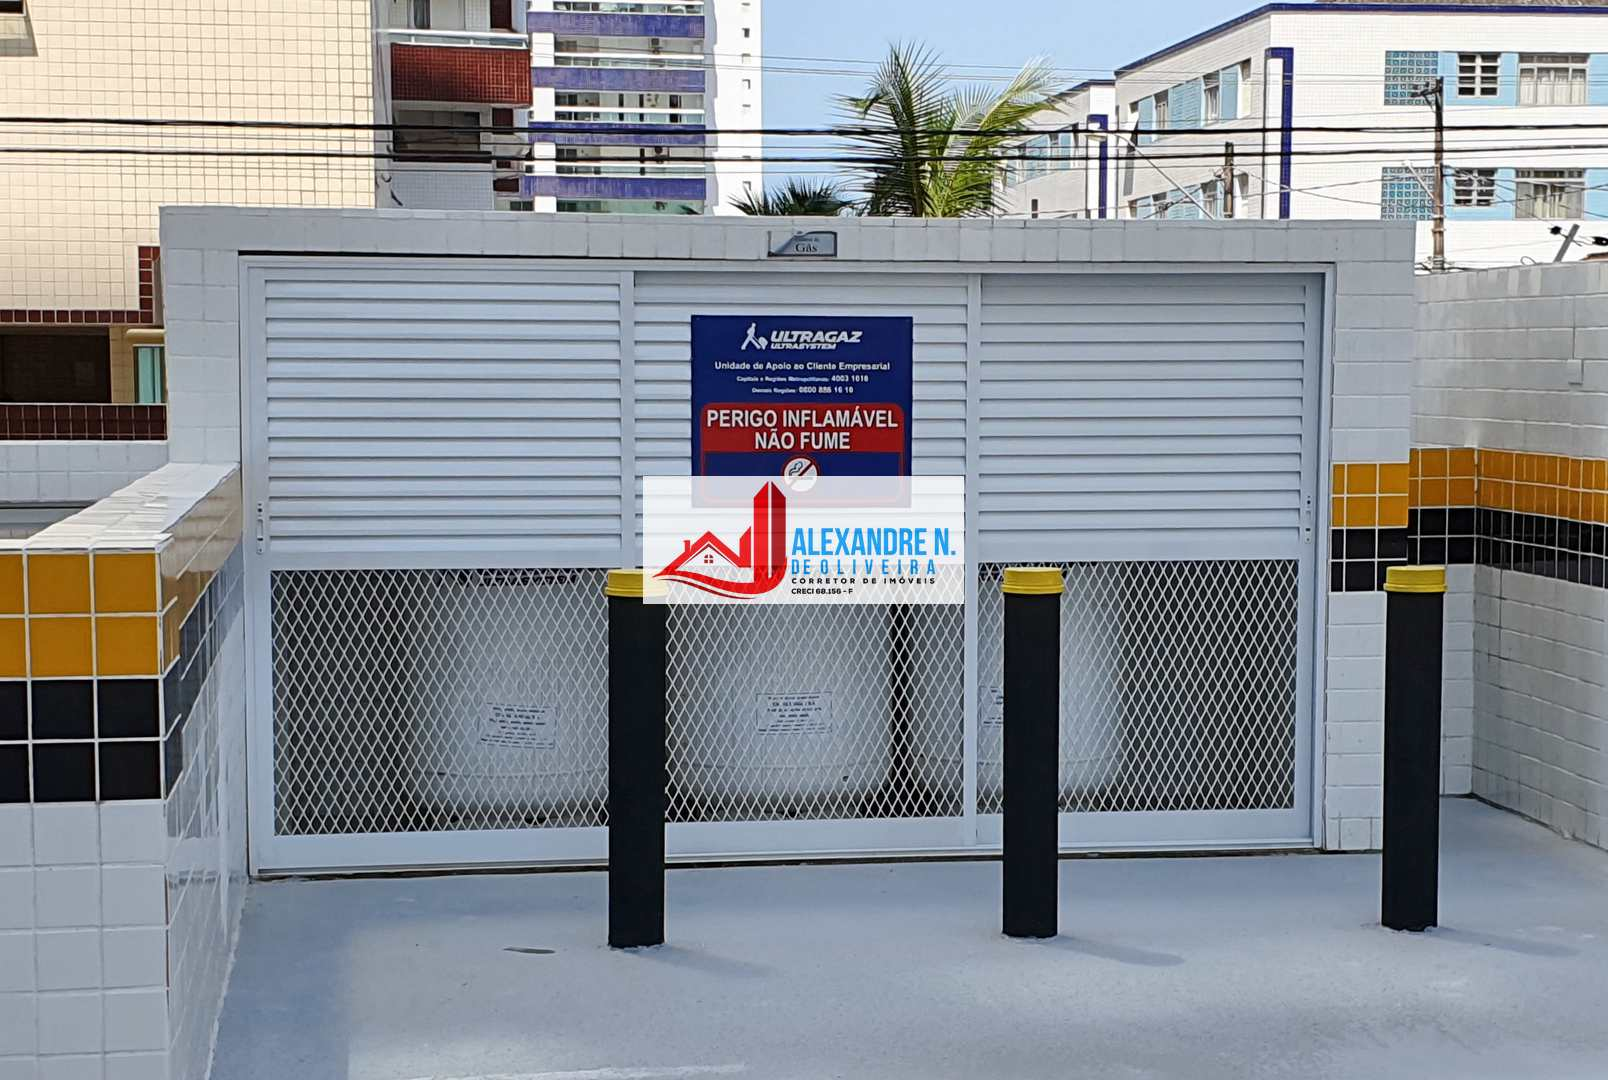 Apartamento 2 dorms, Ocian, Praia Grande, R$ 250 mil, AP00676